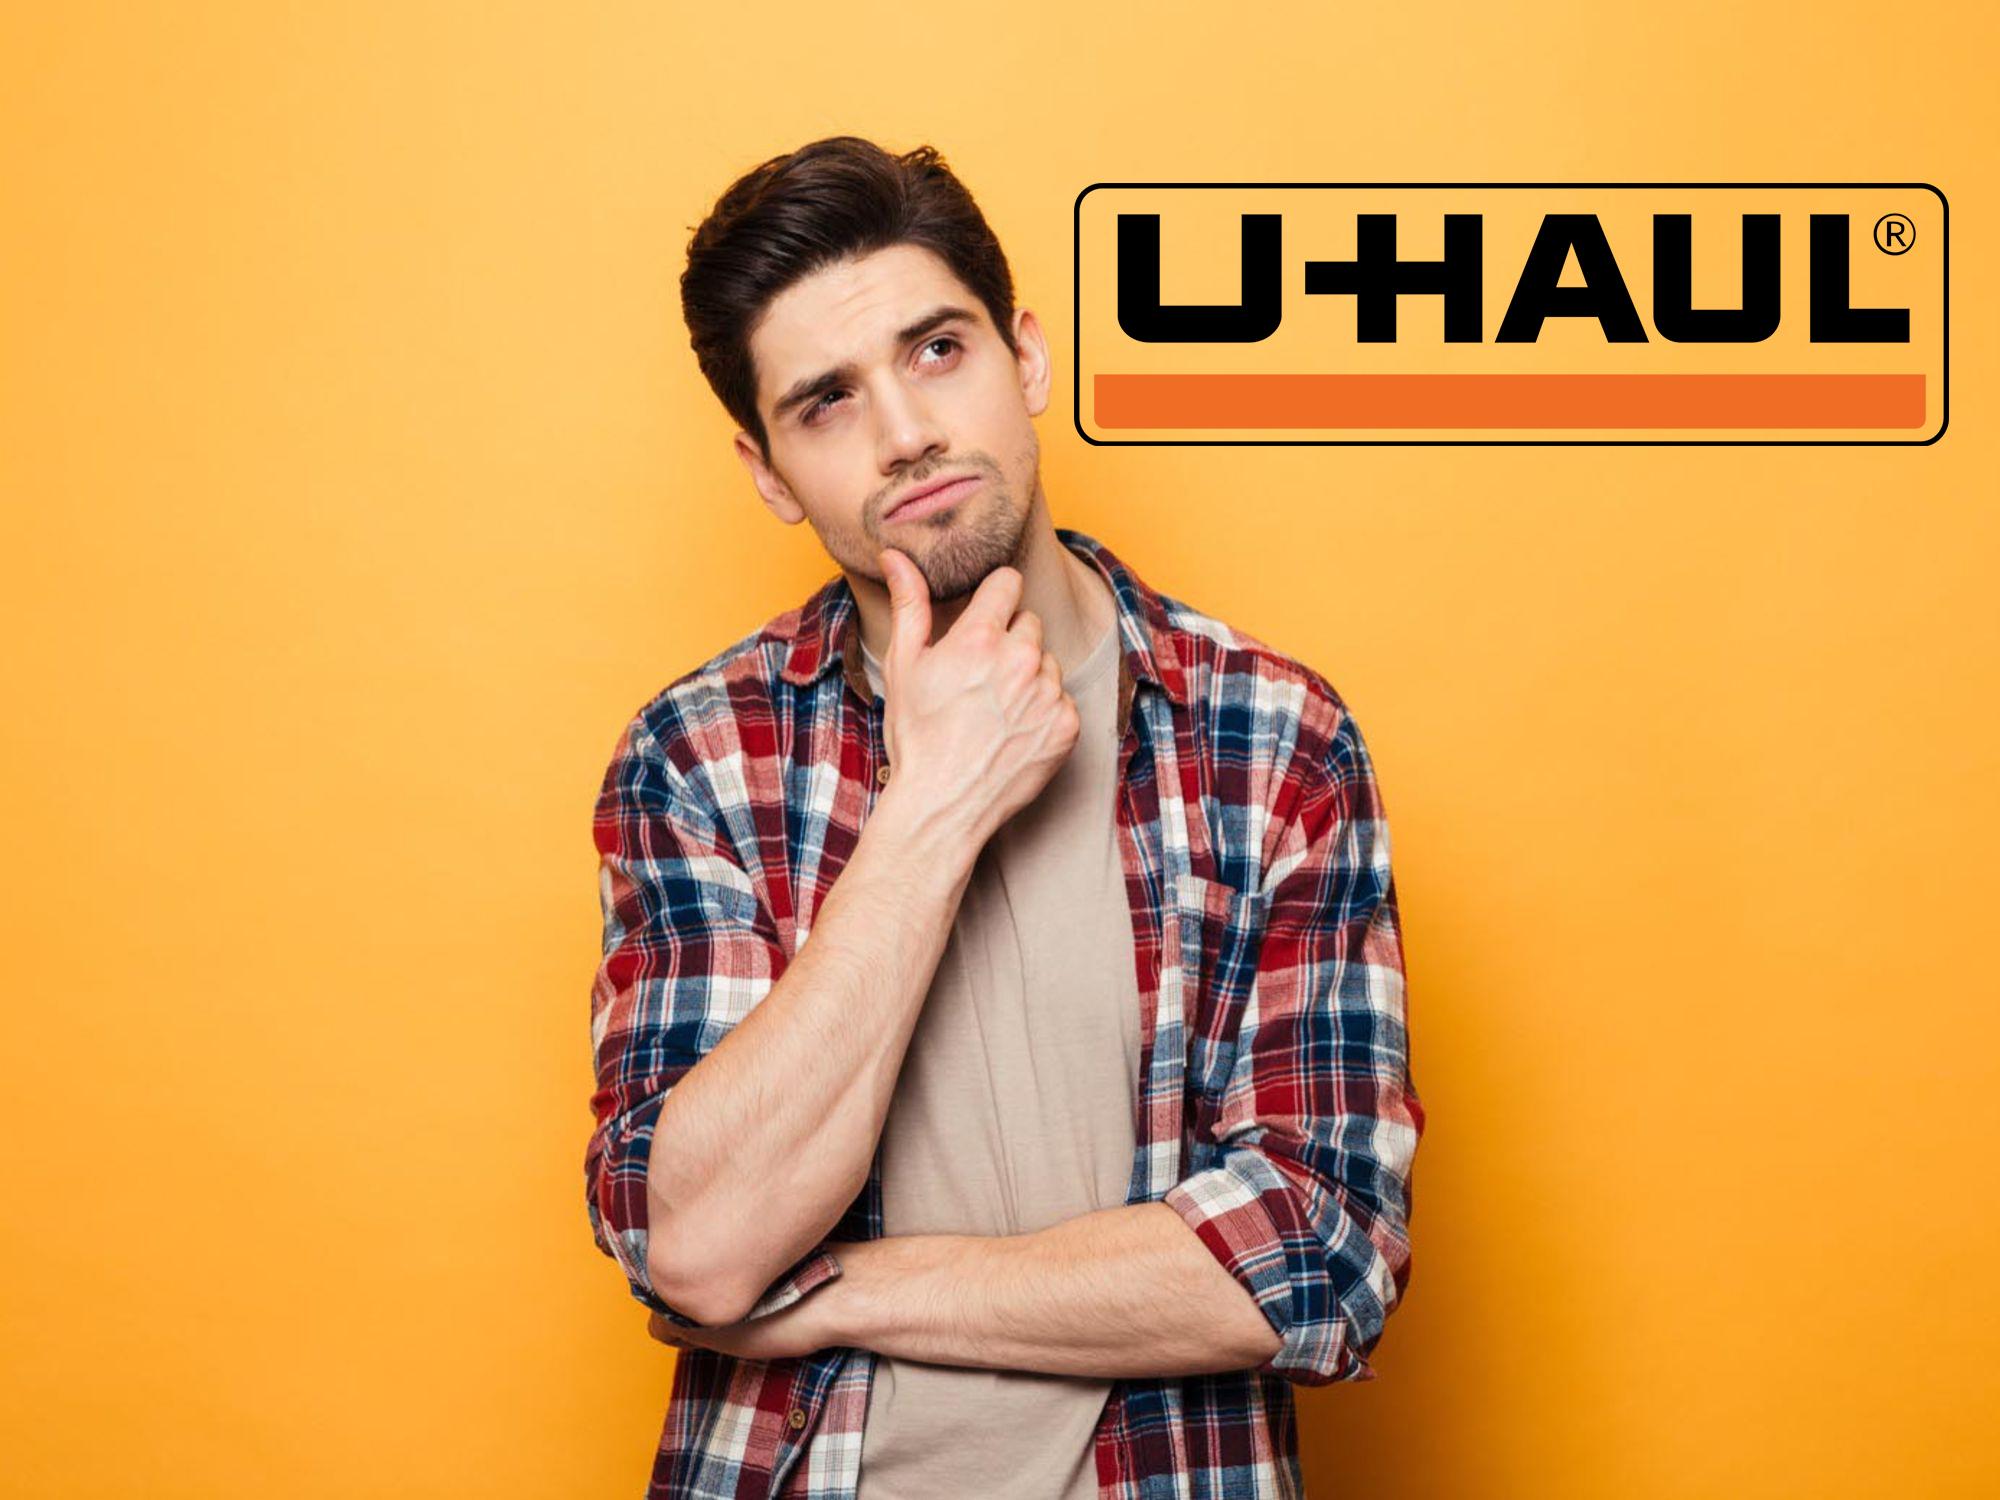 U-Haul Truck Rental: 2021 Review